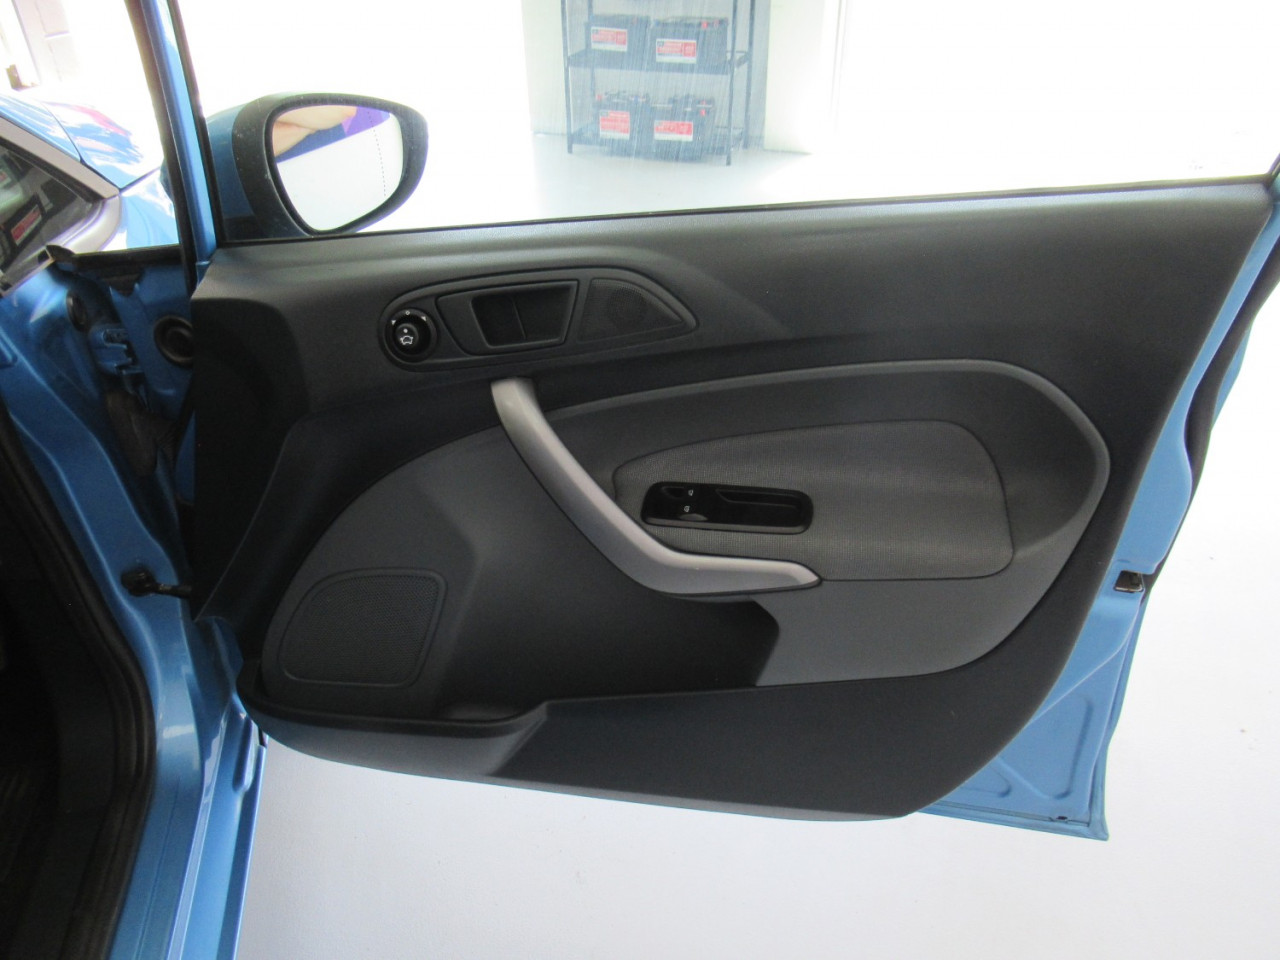 2009 Ford Fiesta WS CL Hatchback Image 17